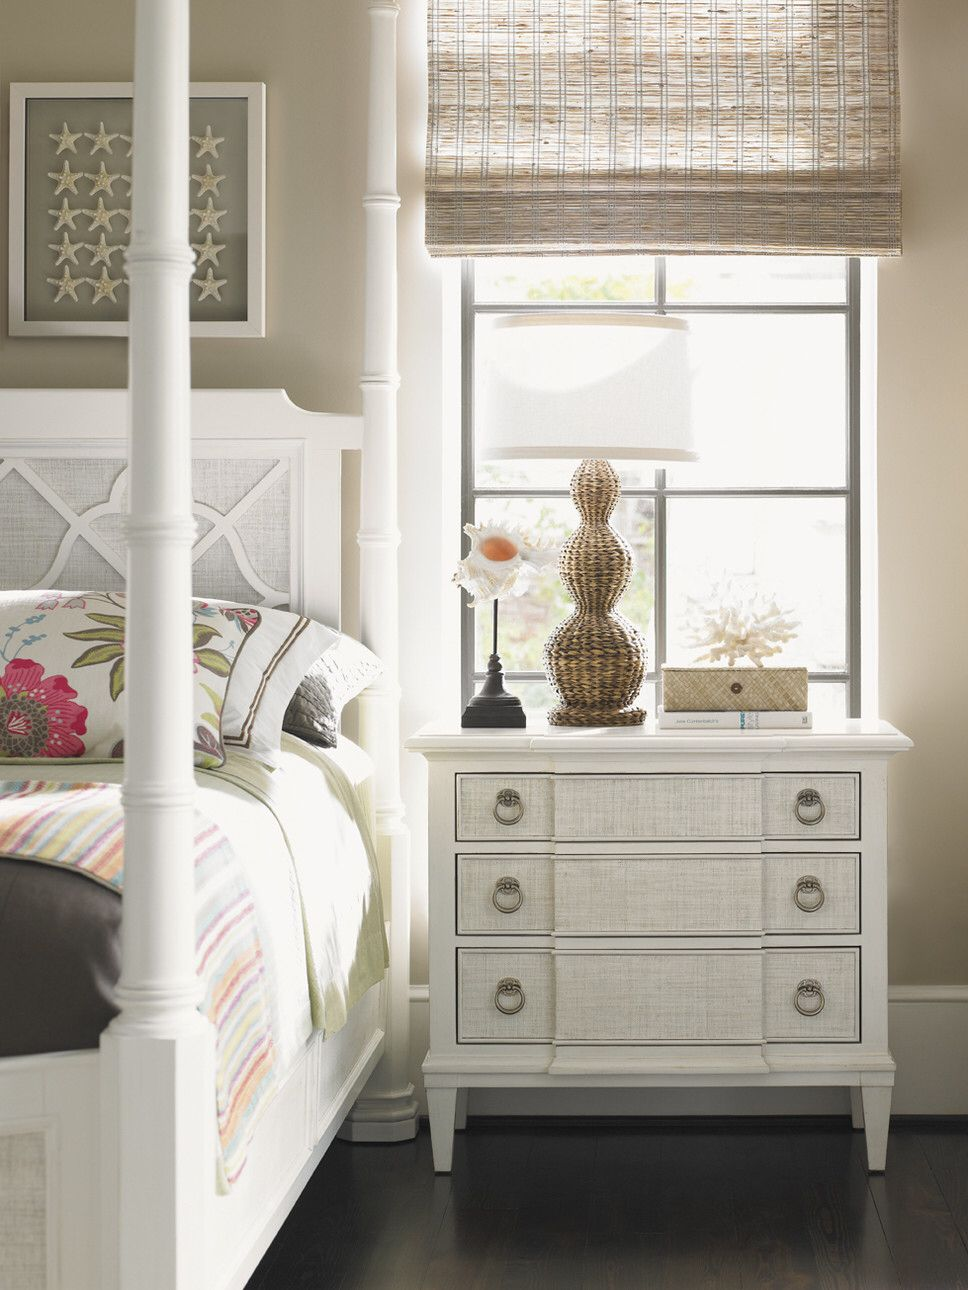 Ivory Key Tucker's Point 3 Drawer Dresser Furniture